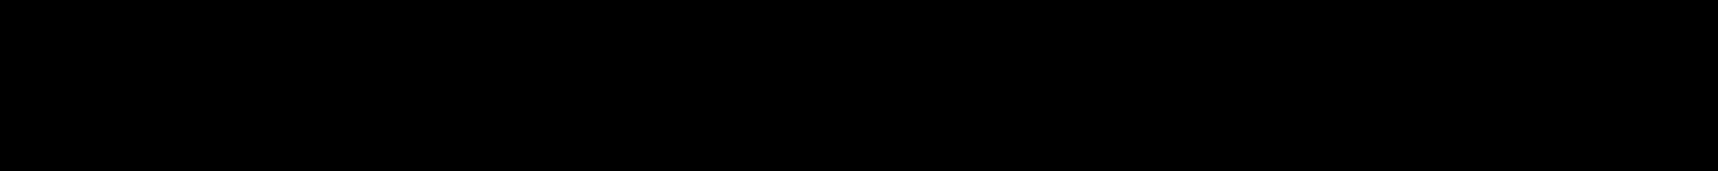 Bullet Hole Fonts Fontspace